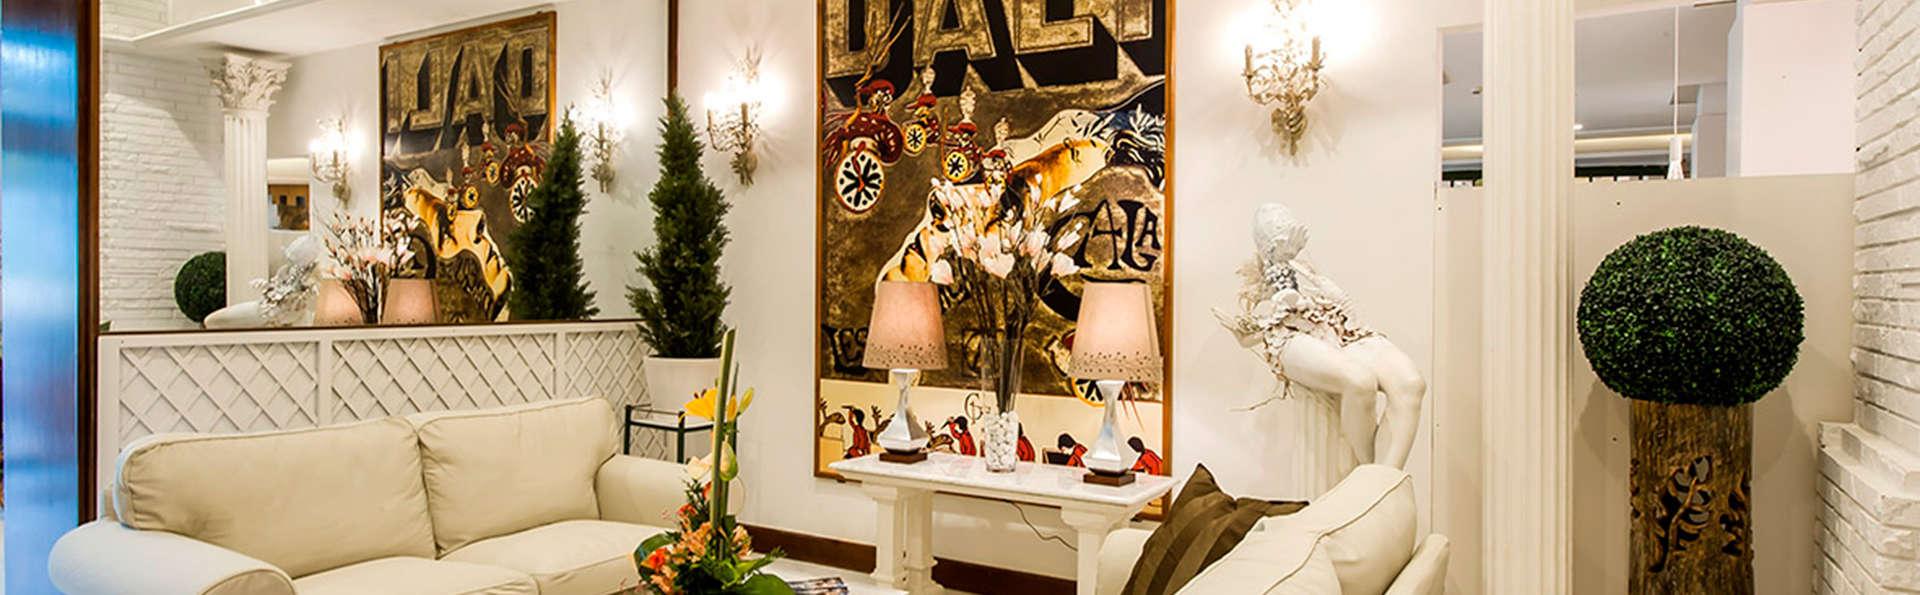 Sercotel Hotel President - EDIT_hall.jpg